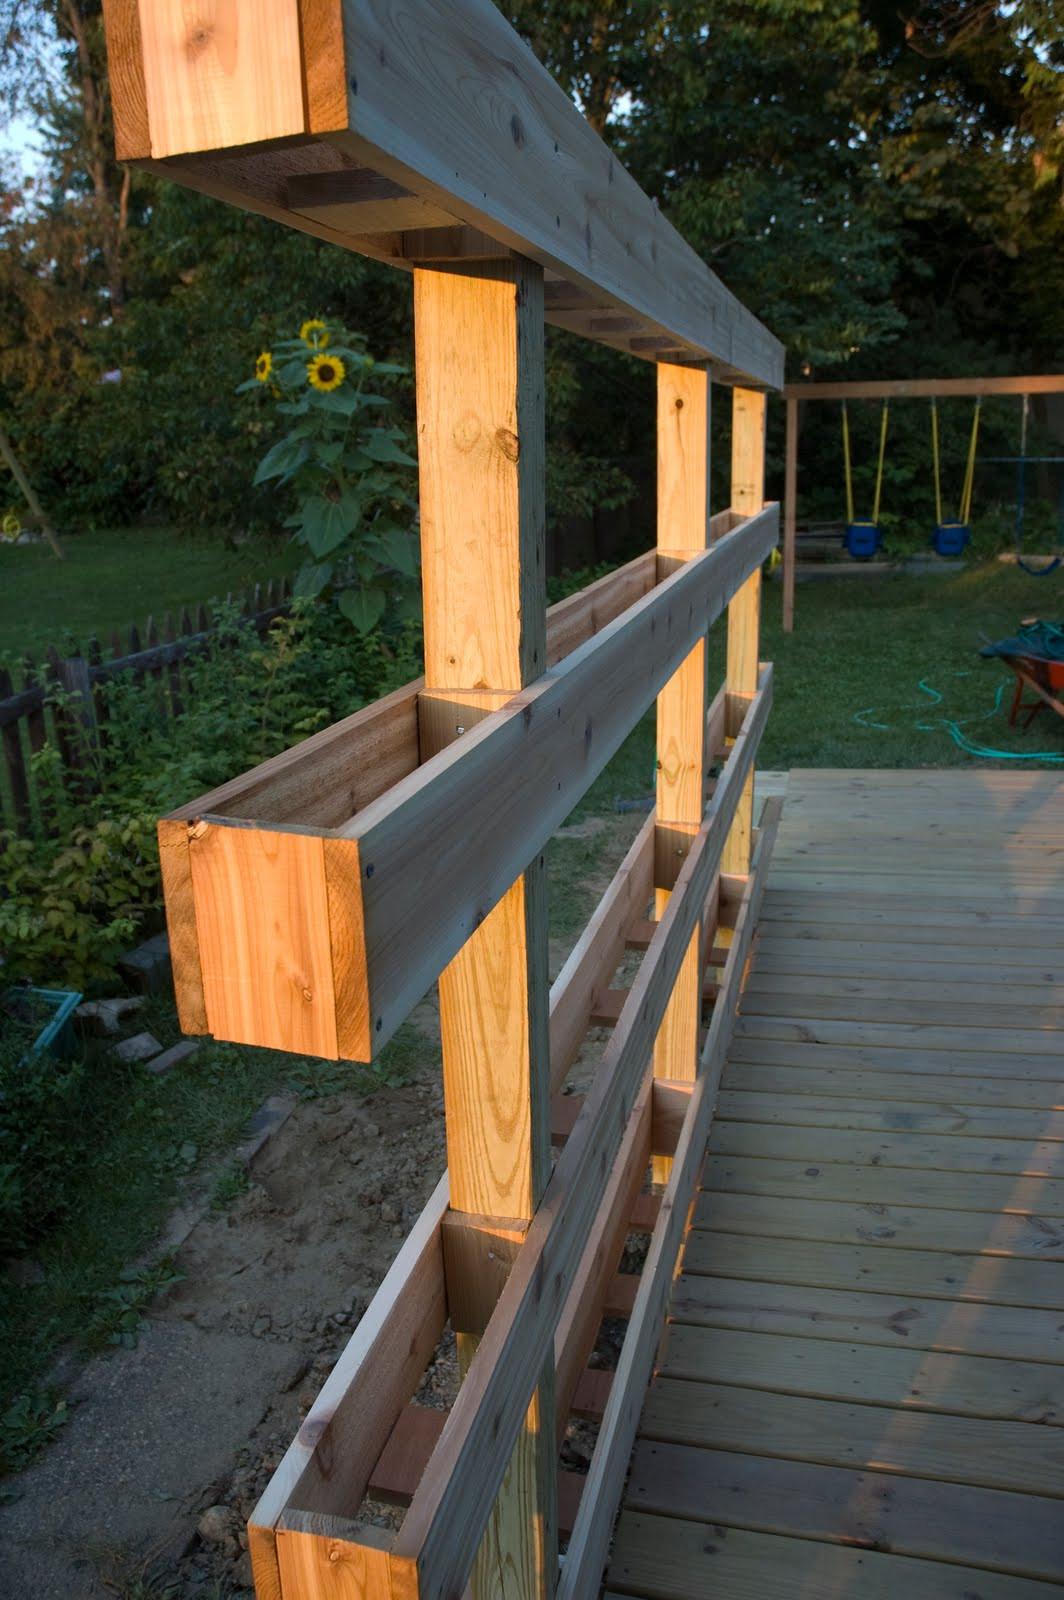 Best ideas about Diy Vertical Garden Wall . Save or Pin 6 DIY Ways to Grow A Vertical Strawberry Garden Porch Advice Now.